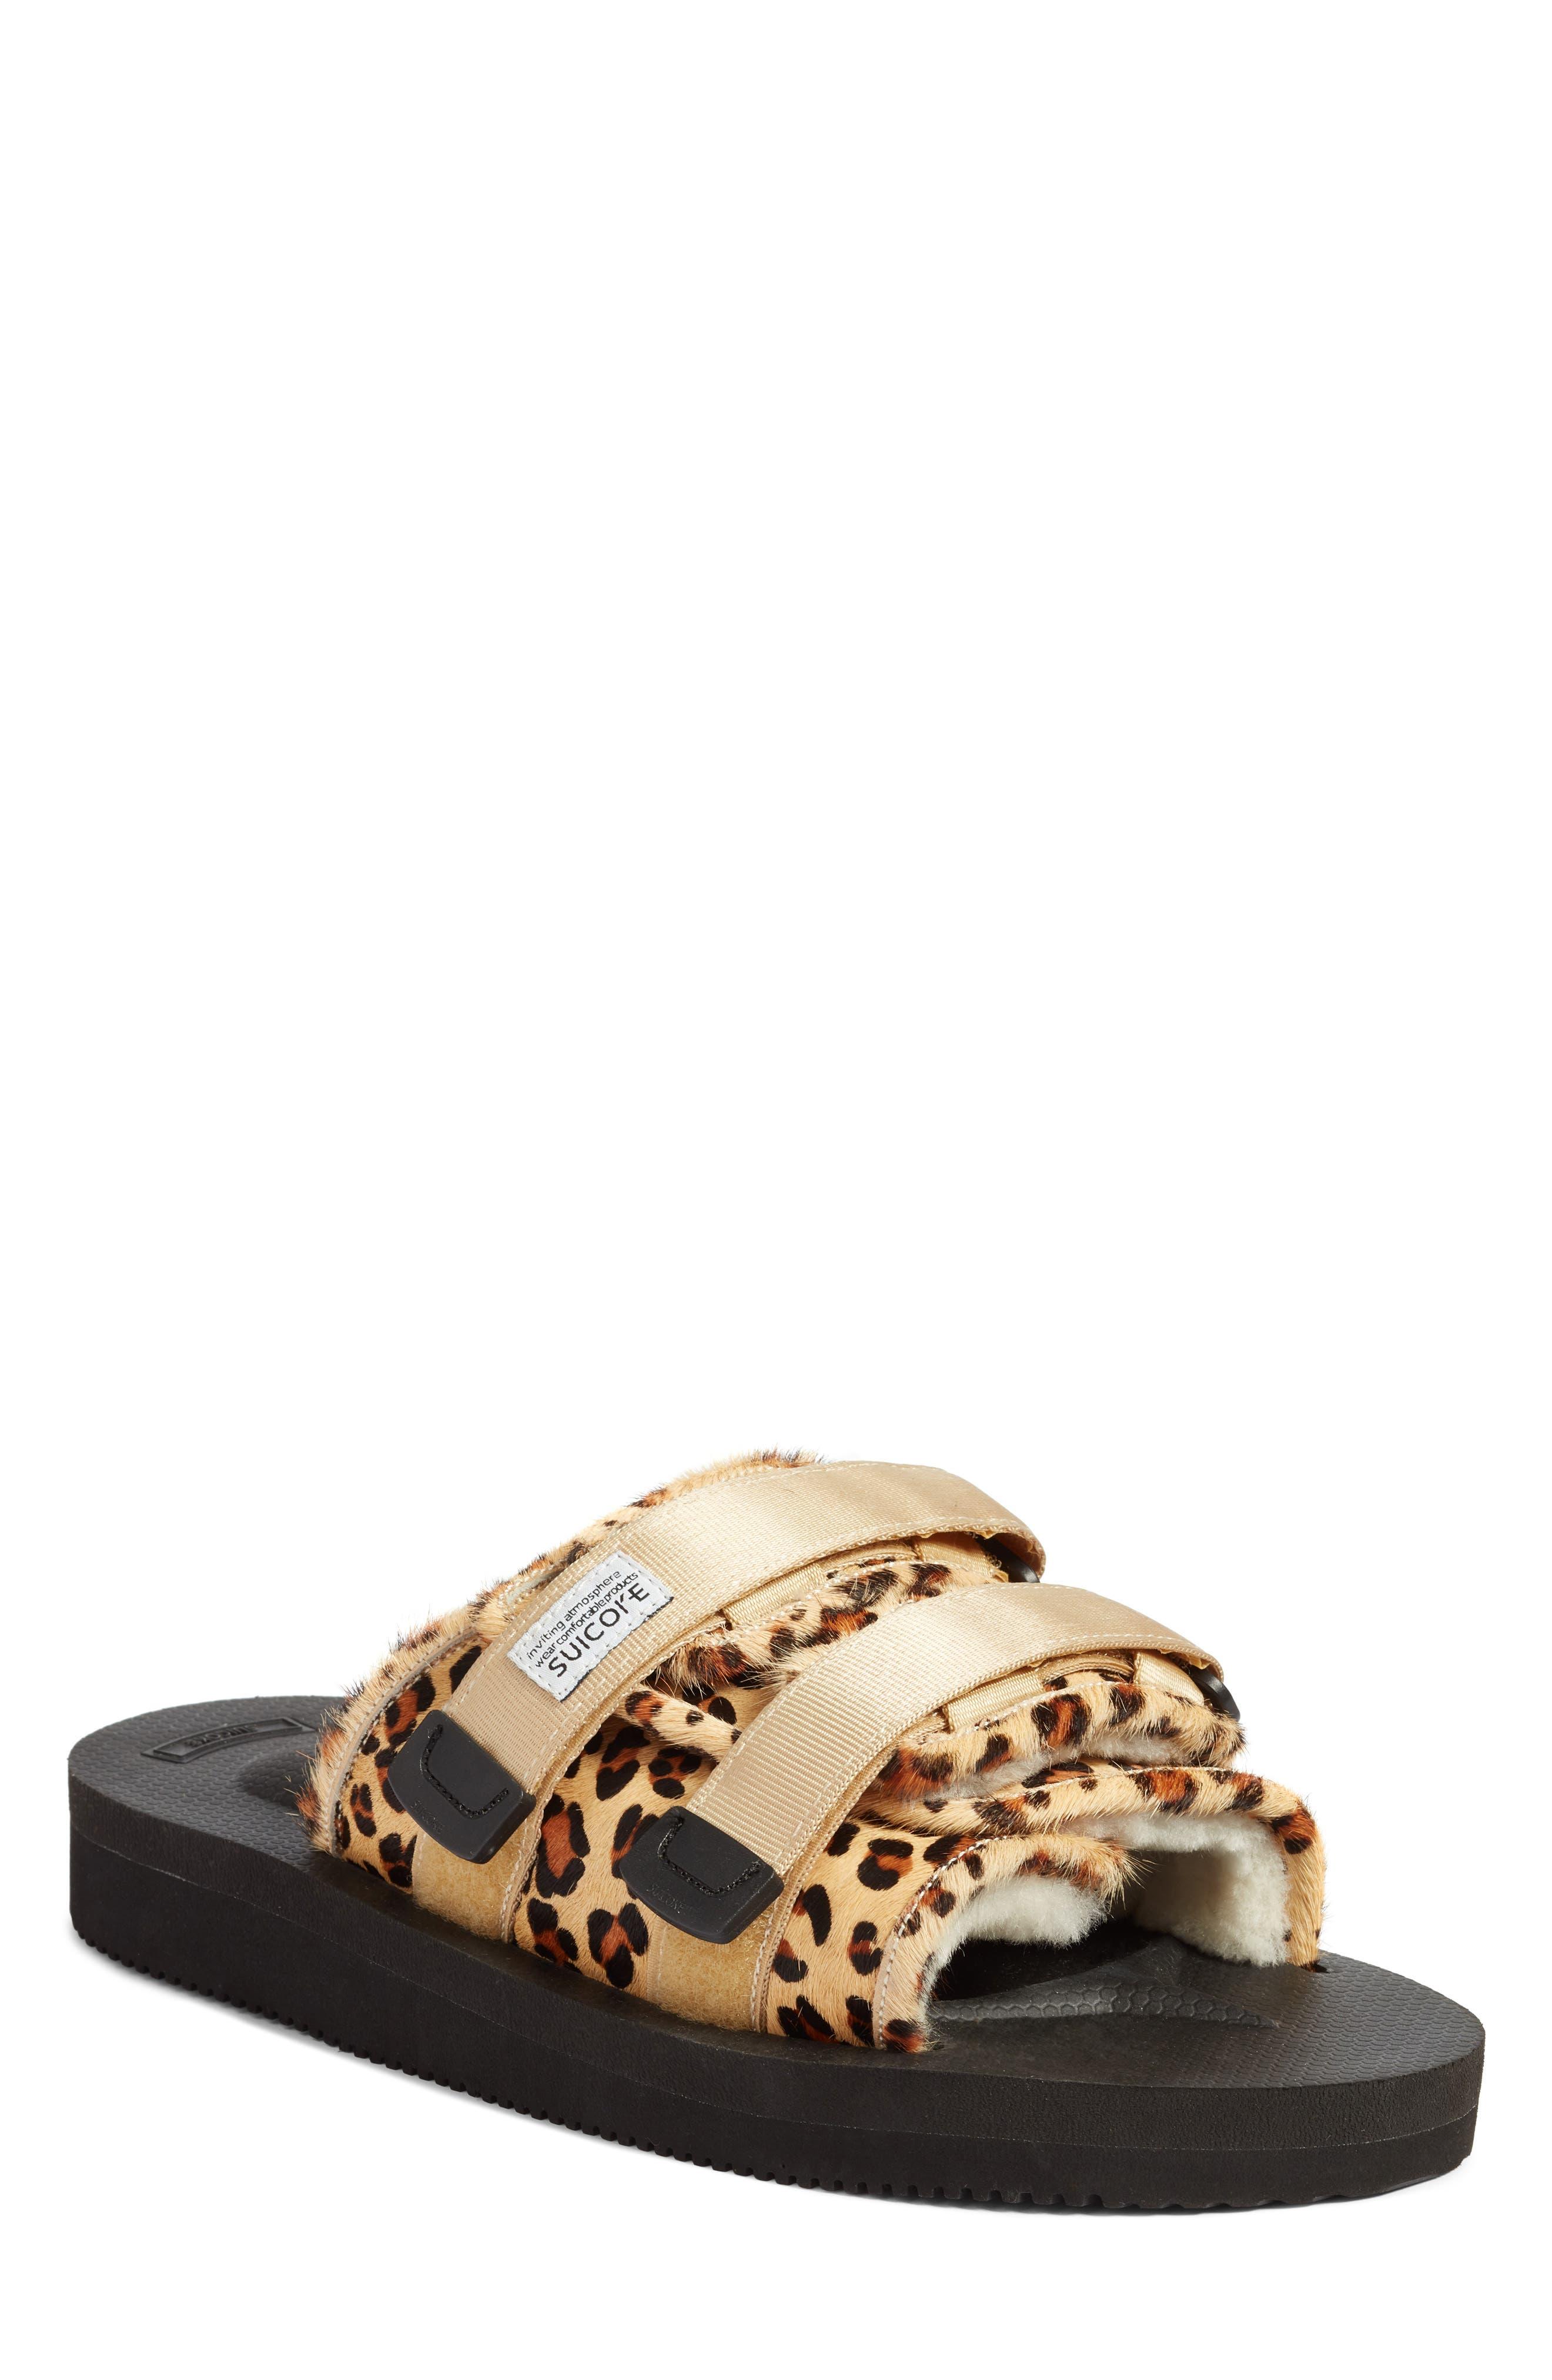 Moto Cab Genuine Calf Hair Slide Sandal,                         Main,                         color, LEOPARD PRINT CALF HAIR